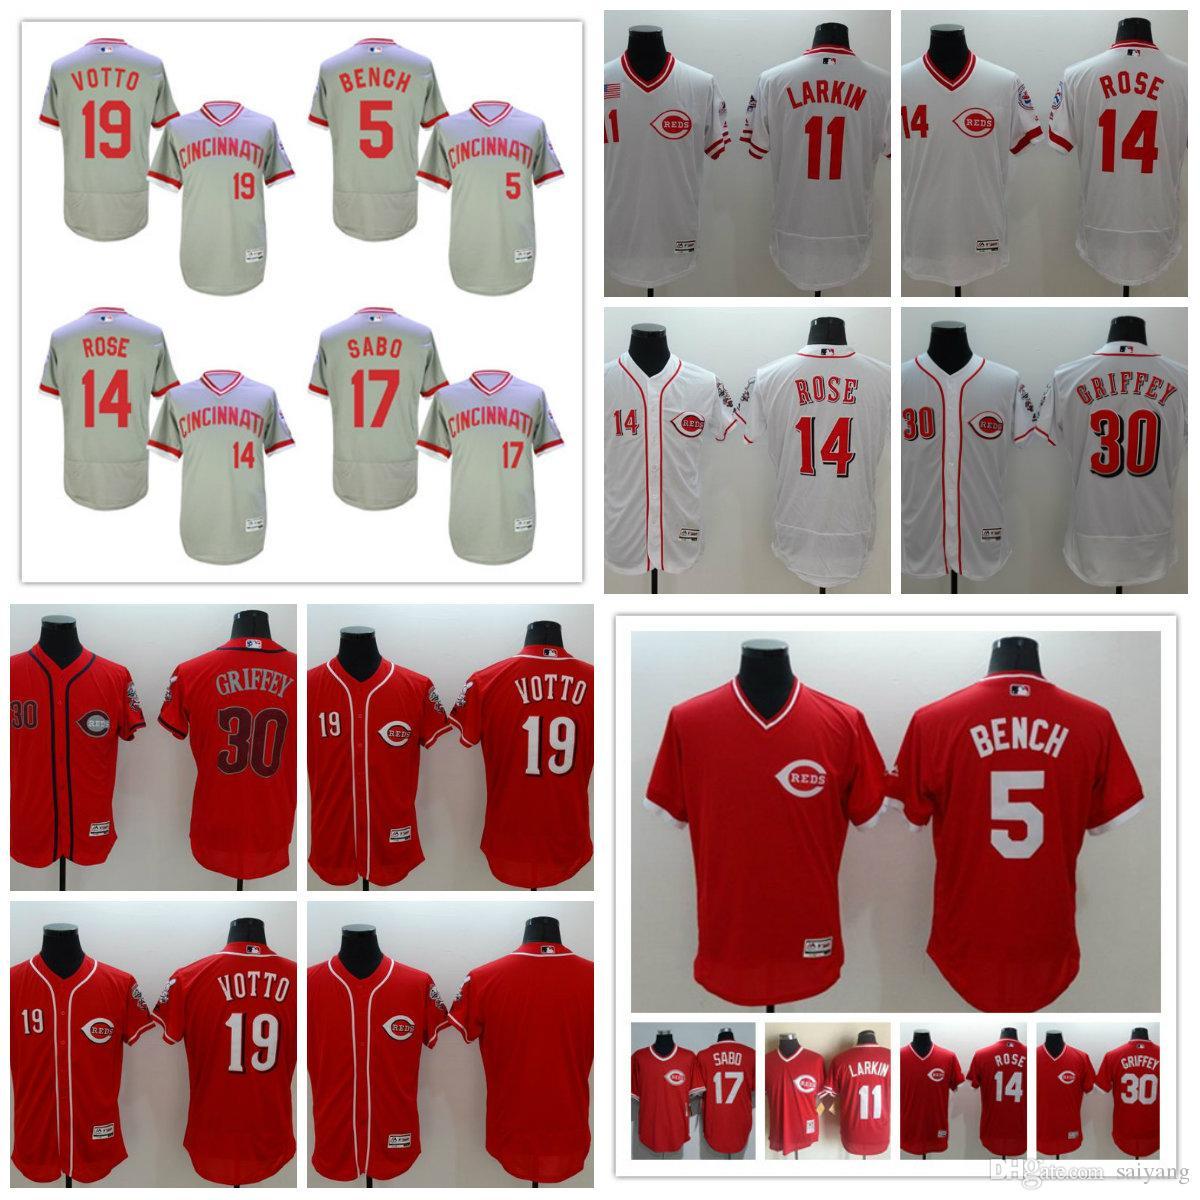 2018 cincinnati reds 30 ken griffey jr jersey 11 barry larkin 19 joey votto 8 morgan 5 bench 14 pete